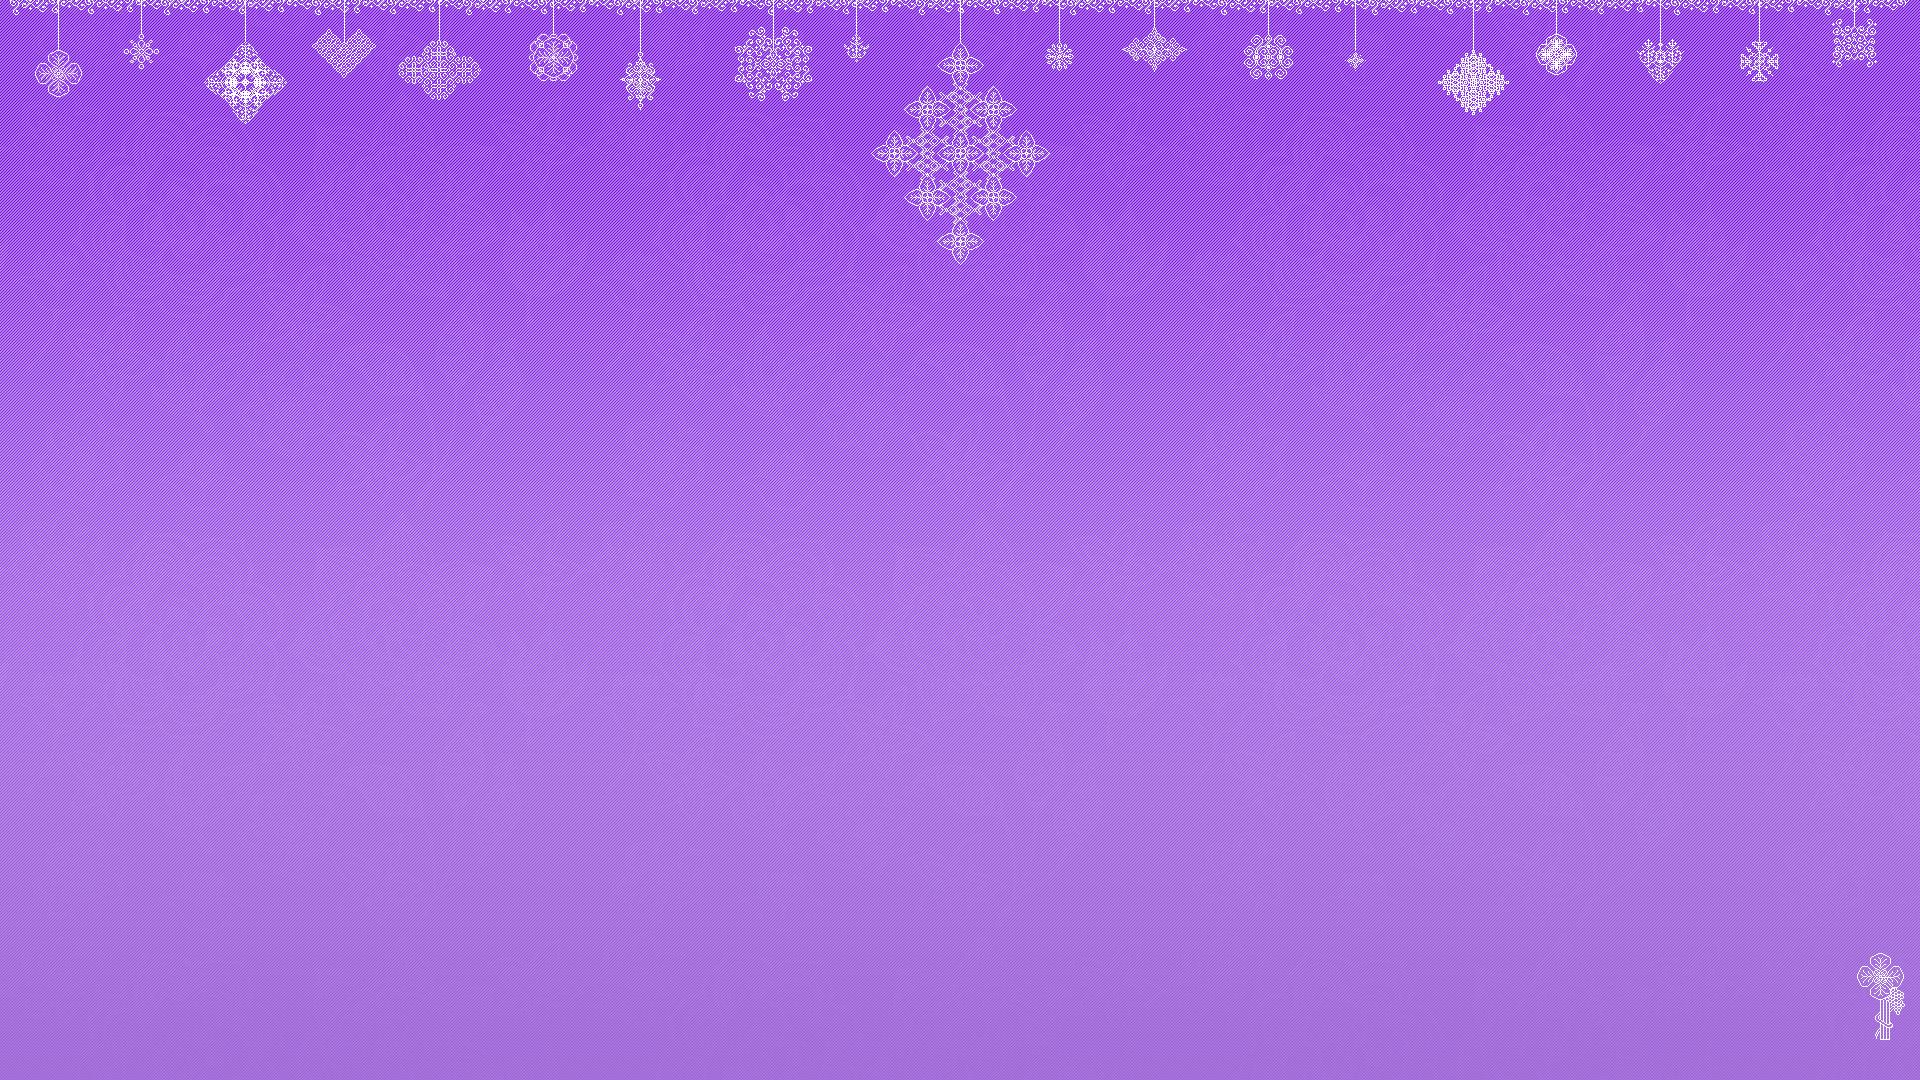 Purple Pixel Background wallpaper   870387 1920x1080